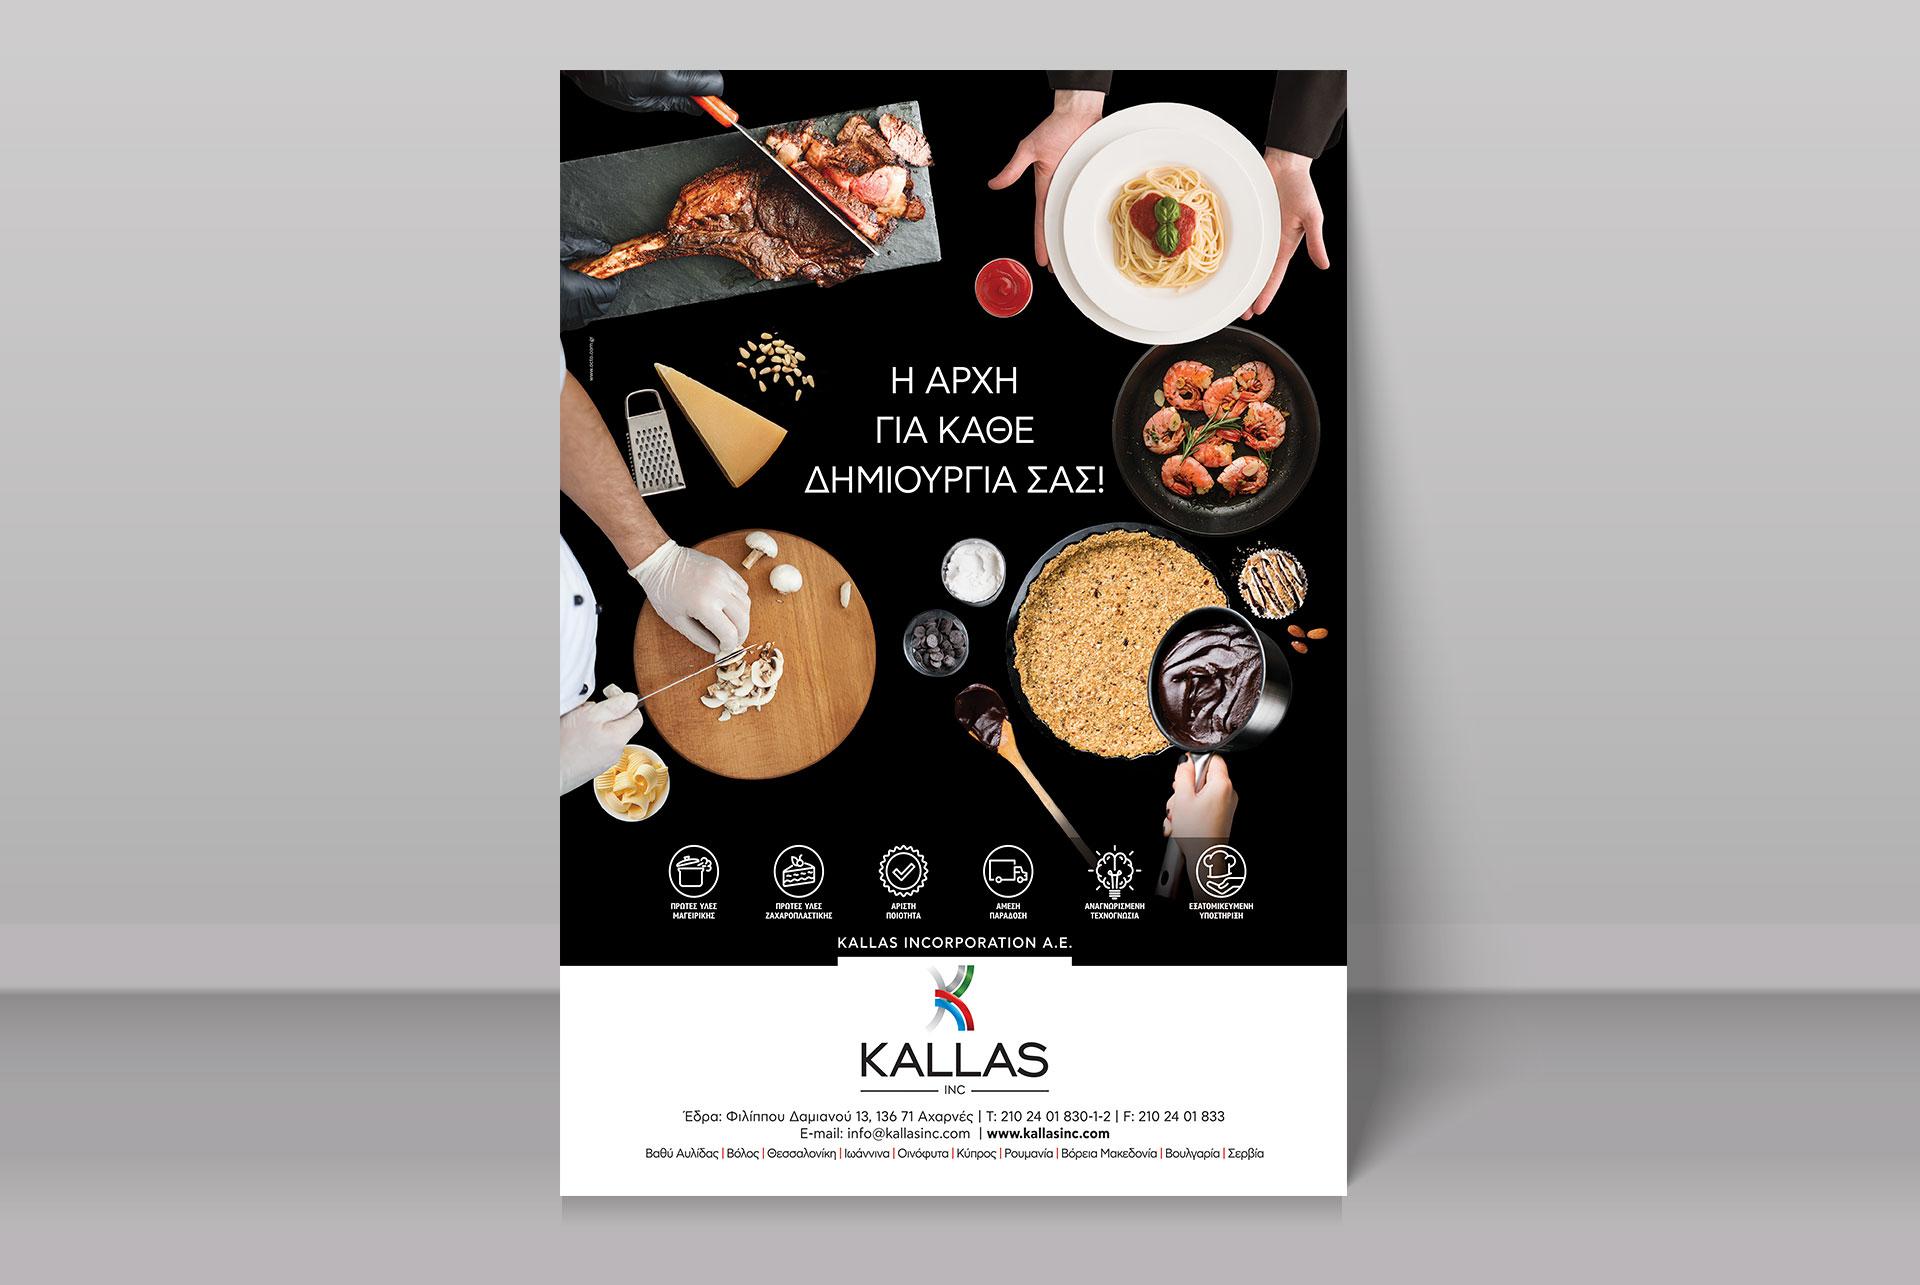 Food Service Advertisement Kallas Inc.